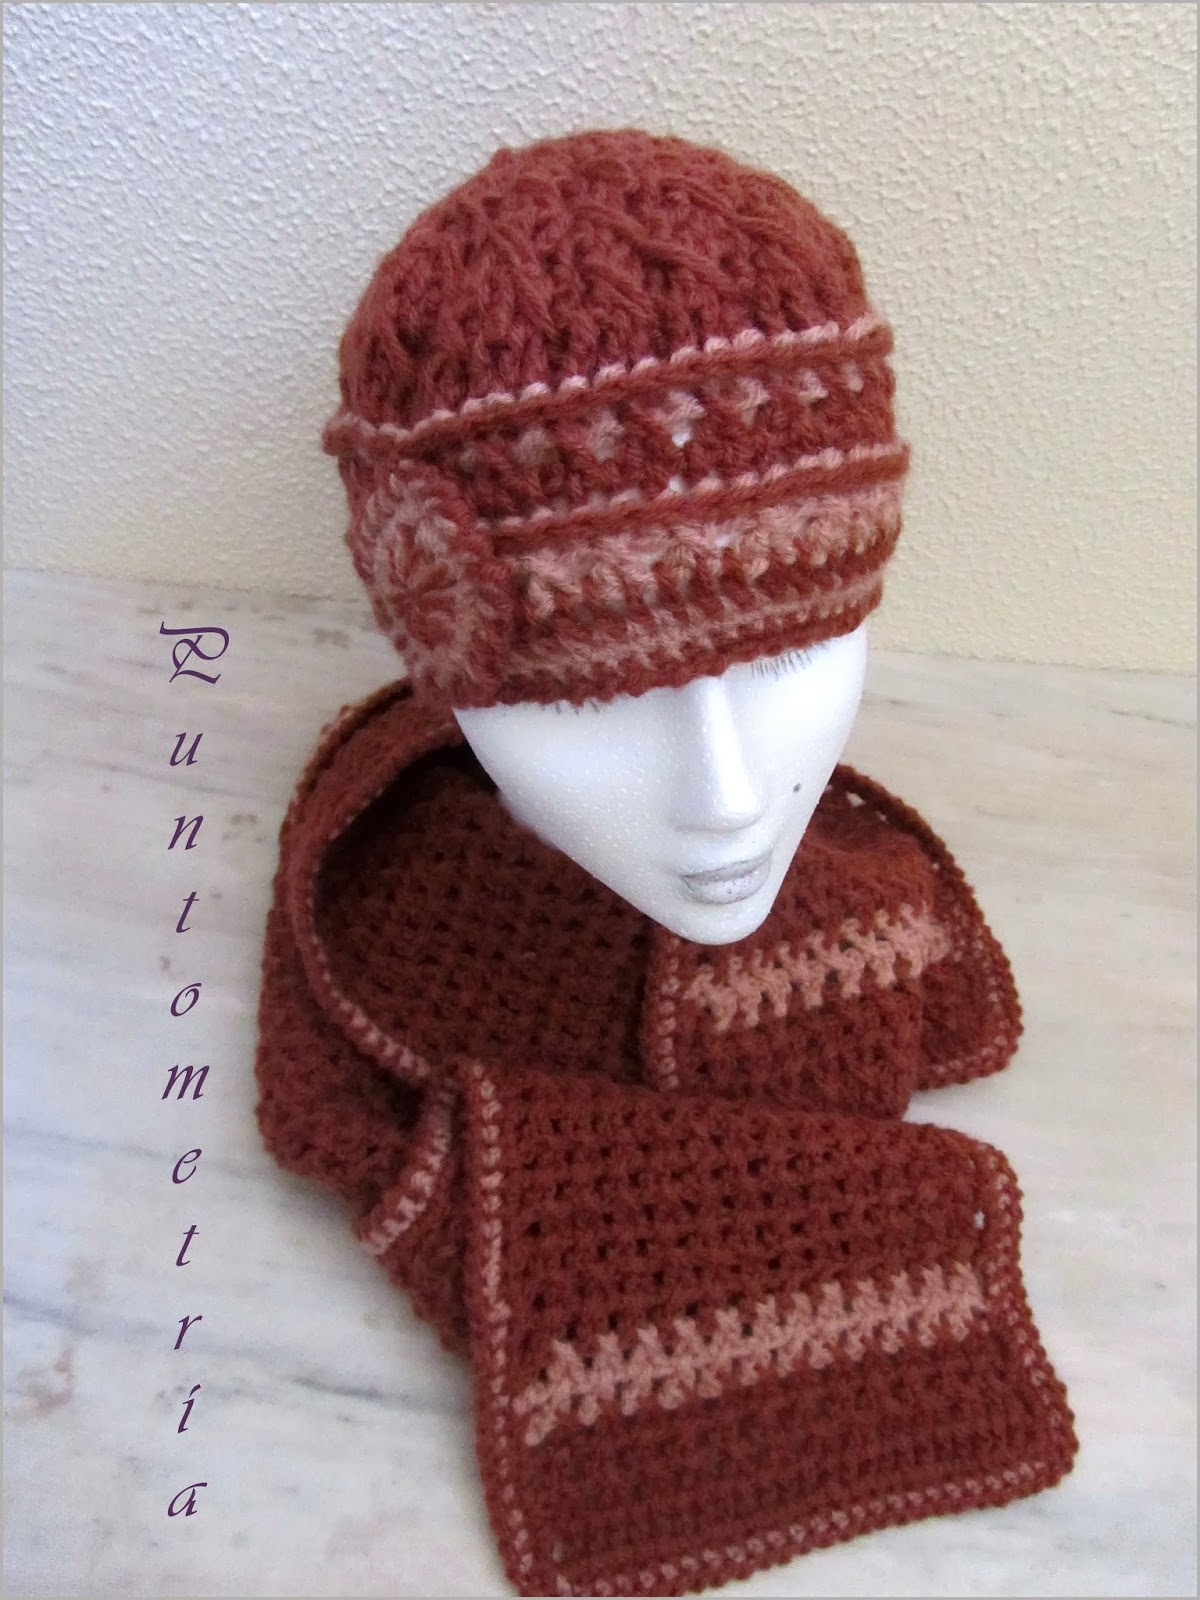 Puntometra noviembre 2013 #1: Gorro bufanda crochet otoño